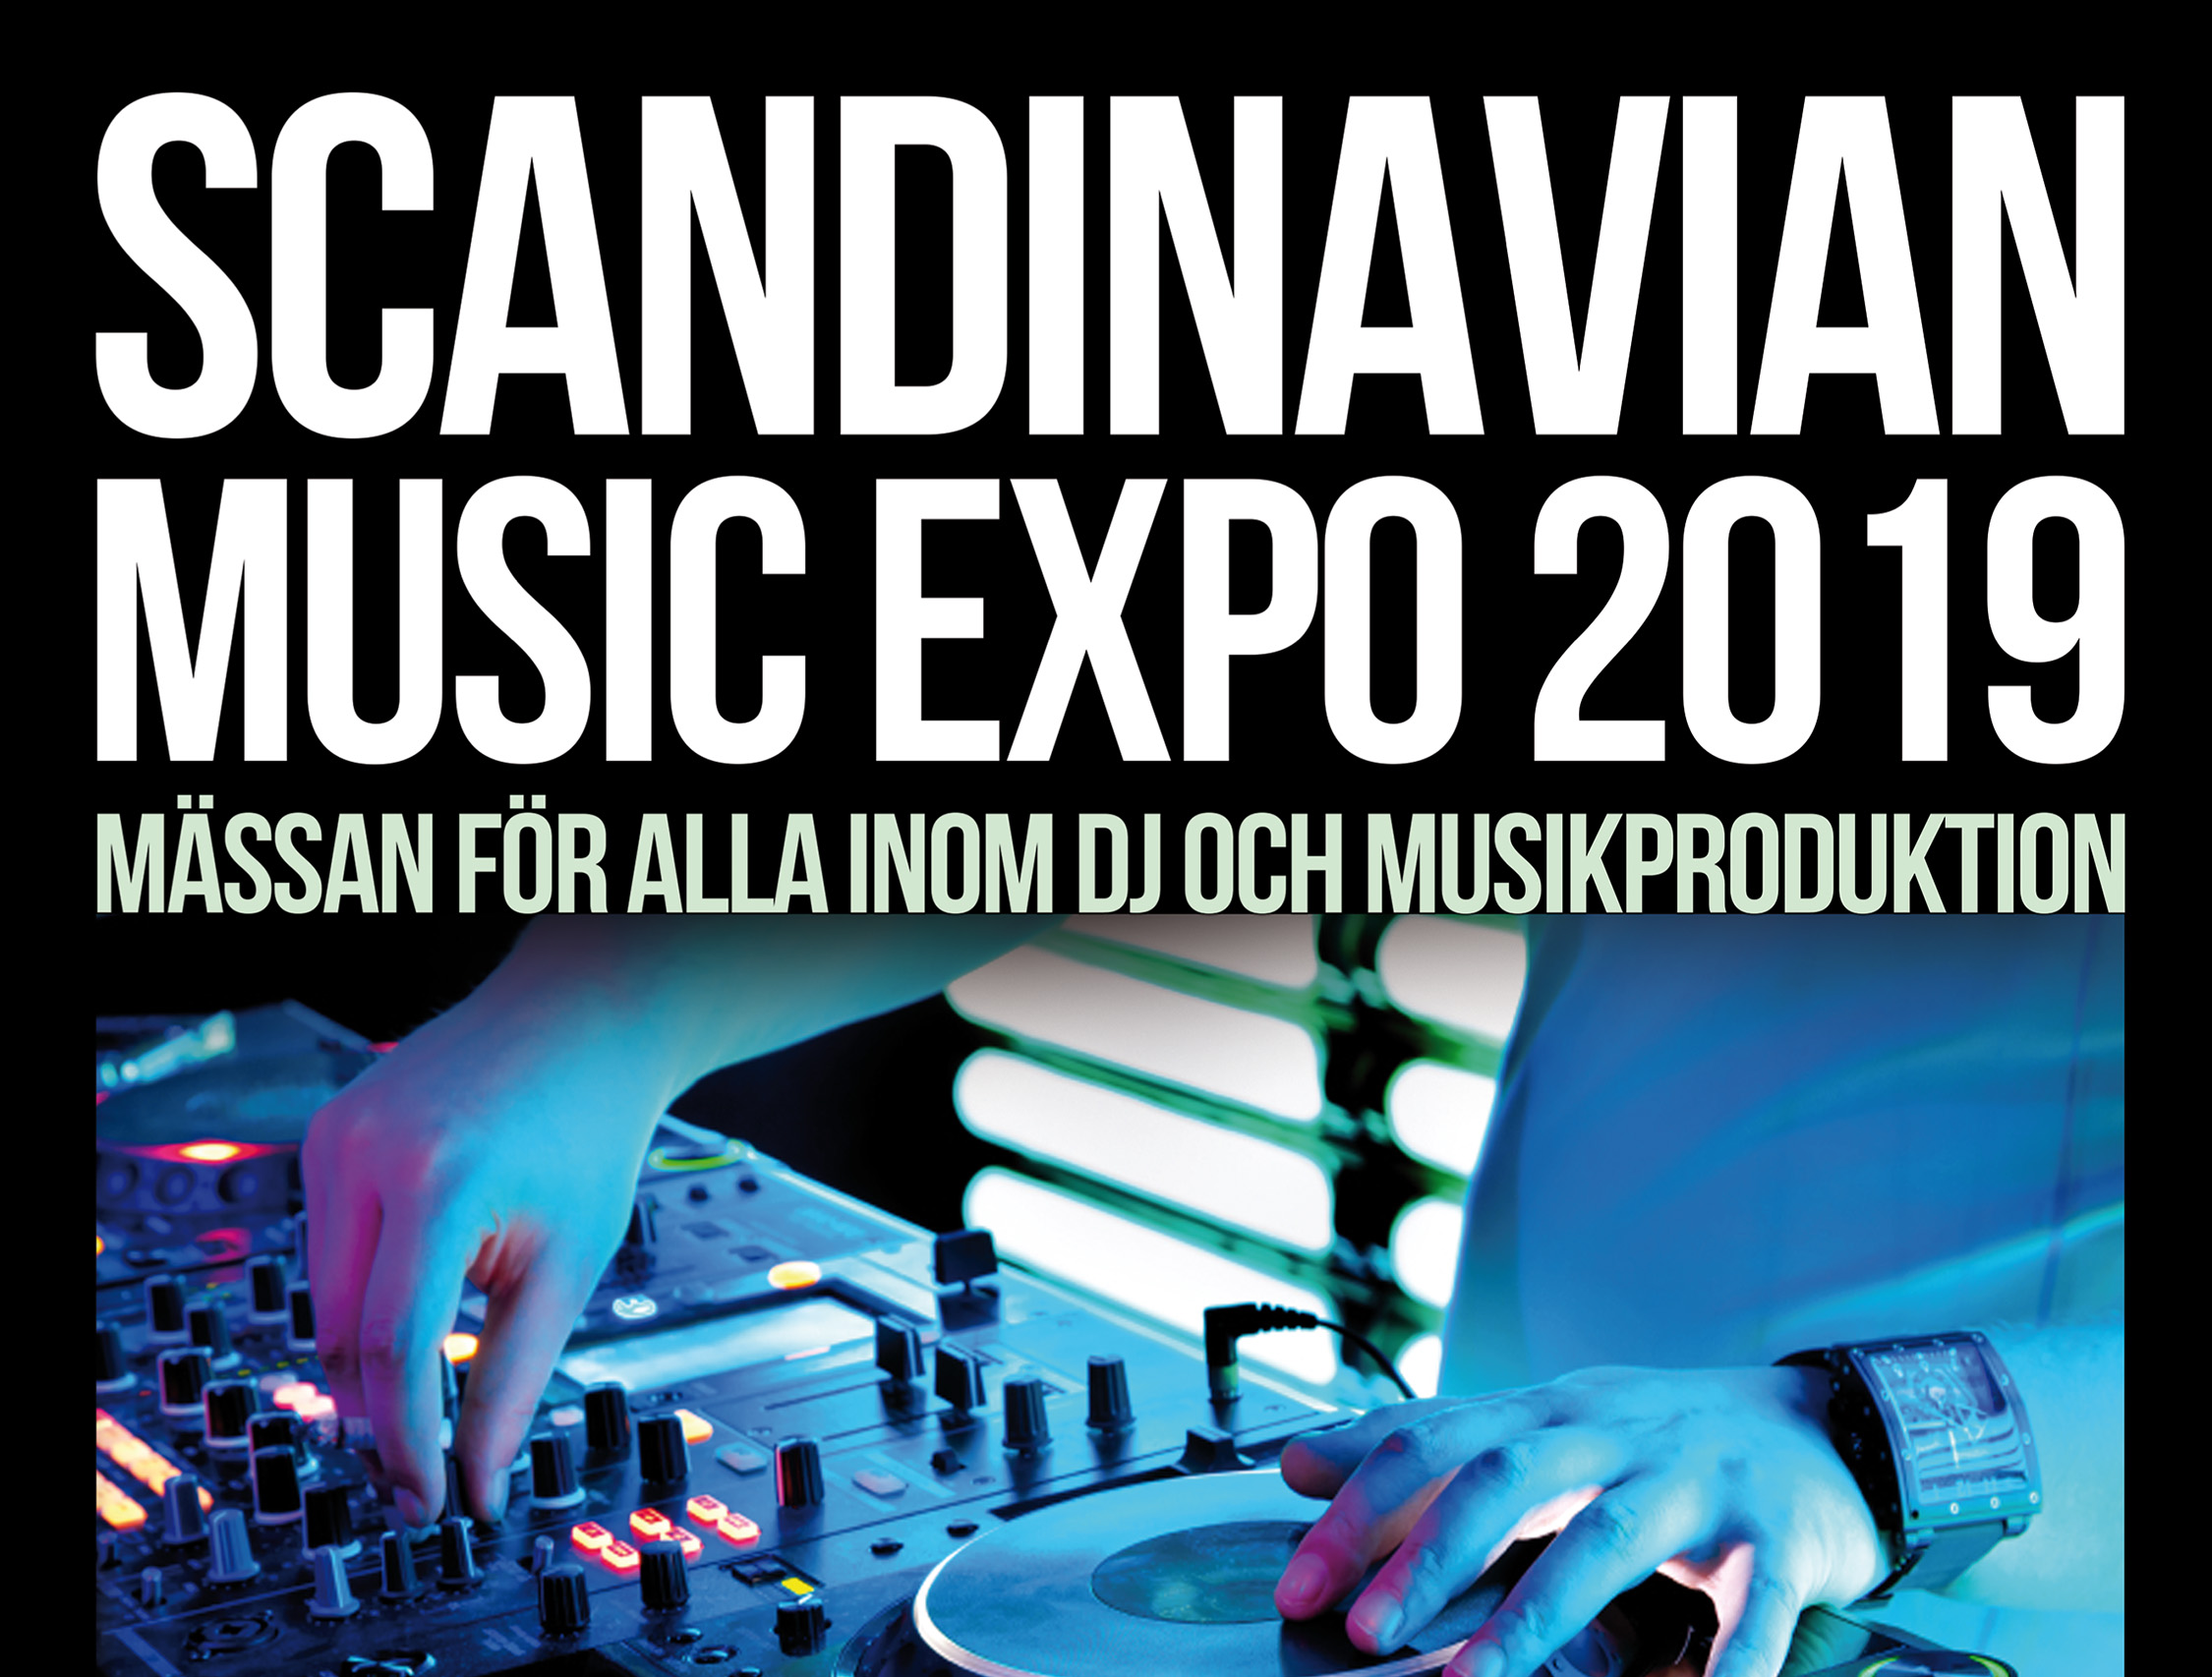 Fitzpatrick ställer ut på Scandinavian Music Expo 14:e september 2019